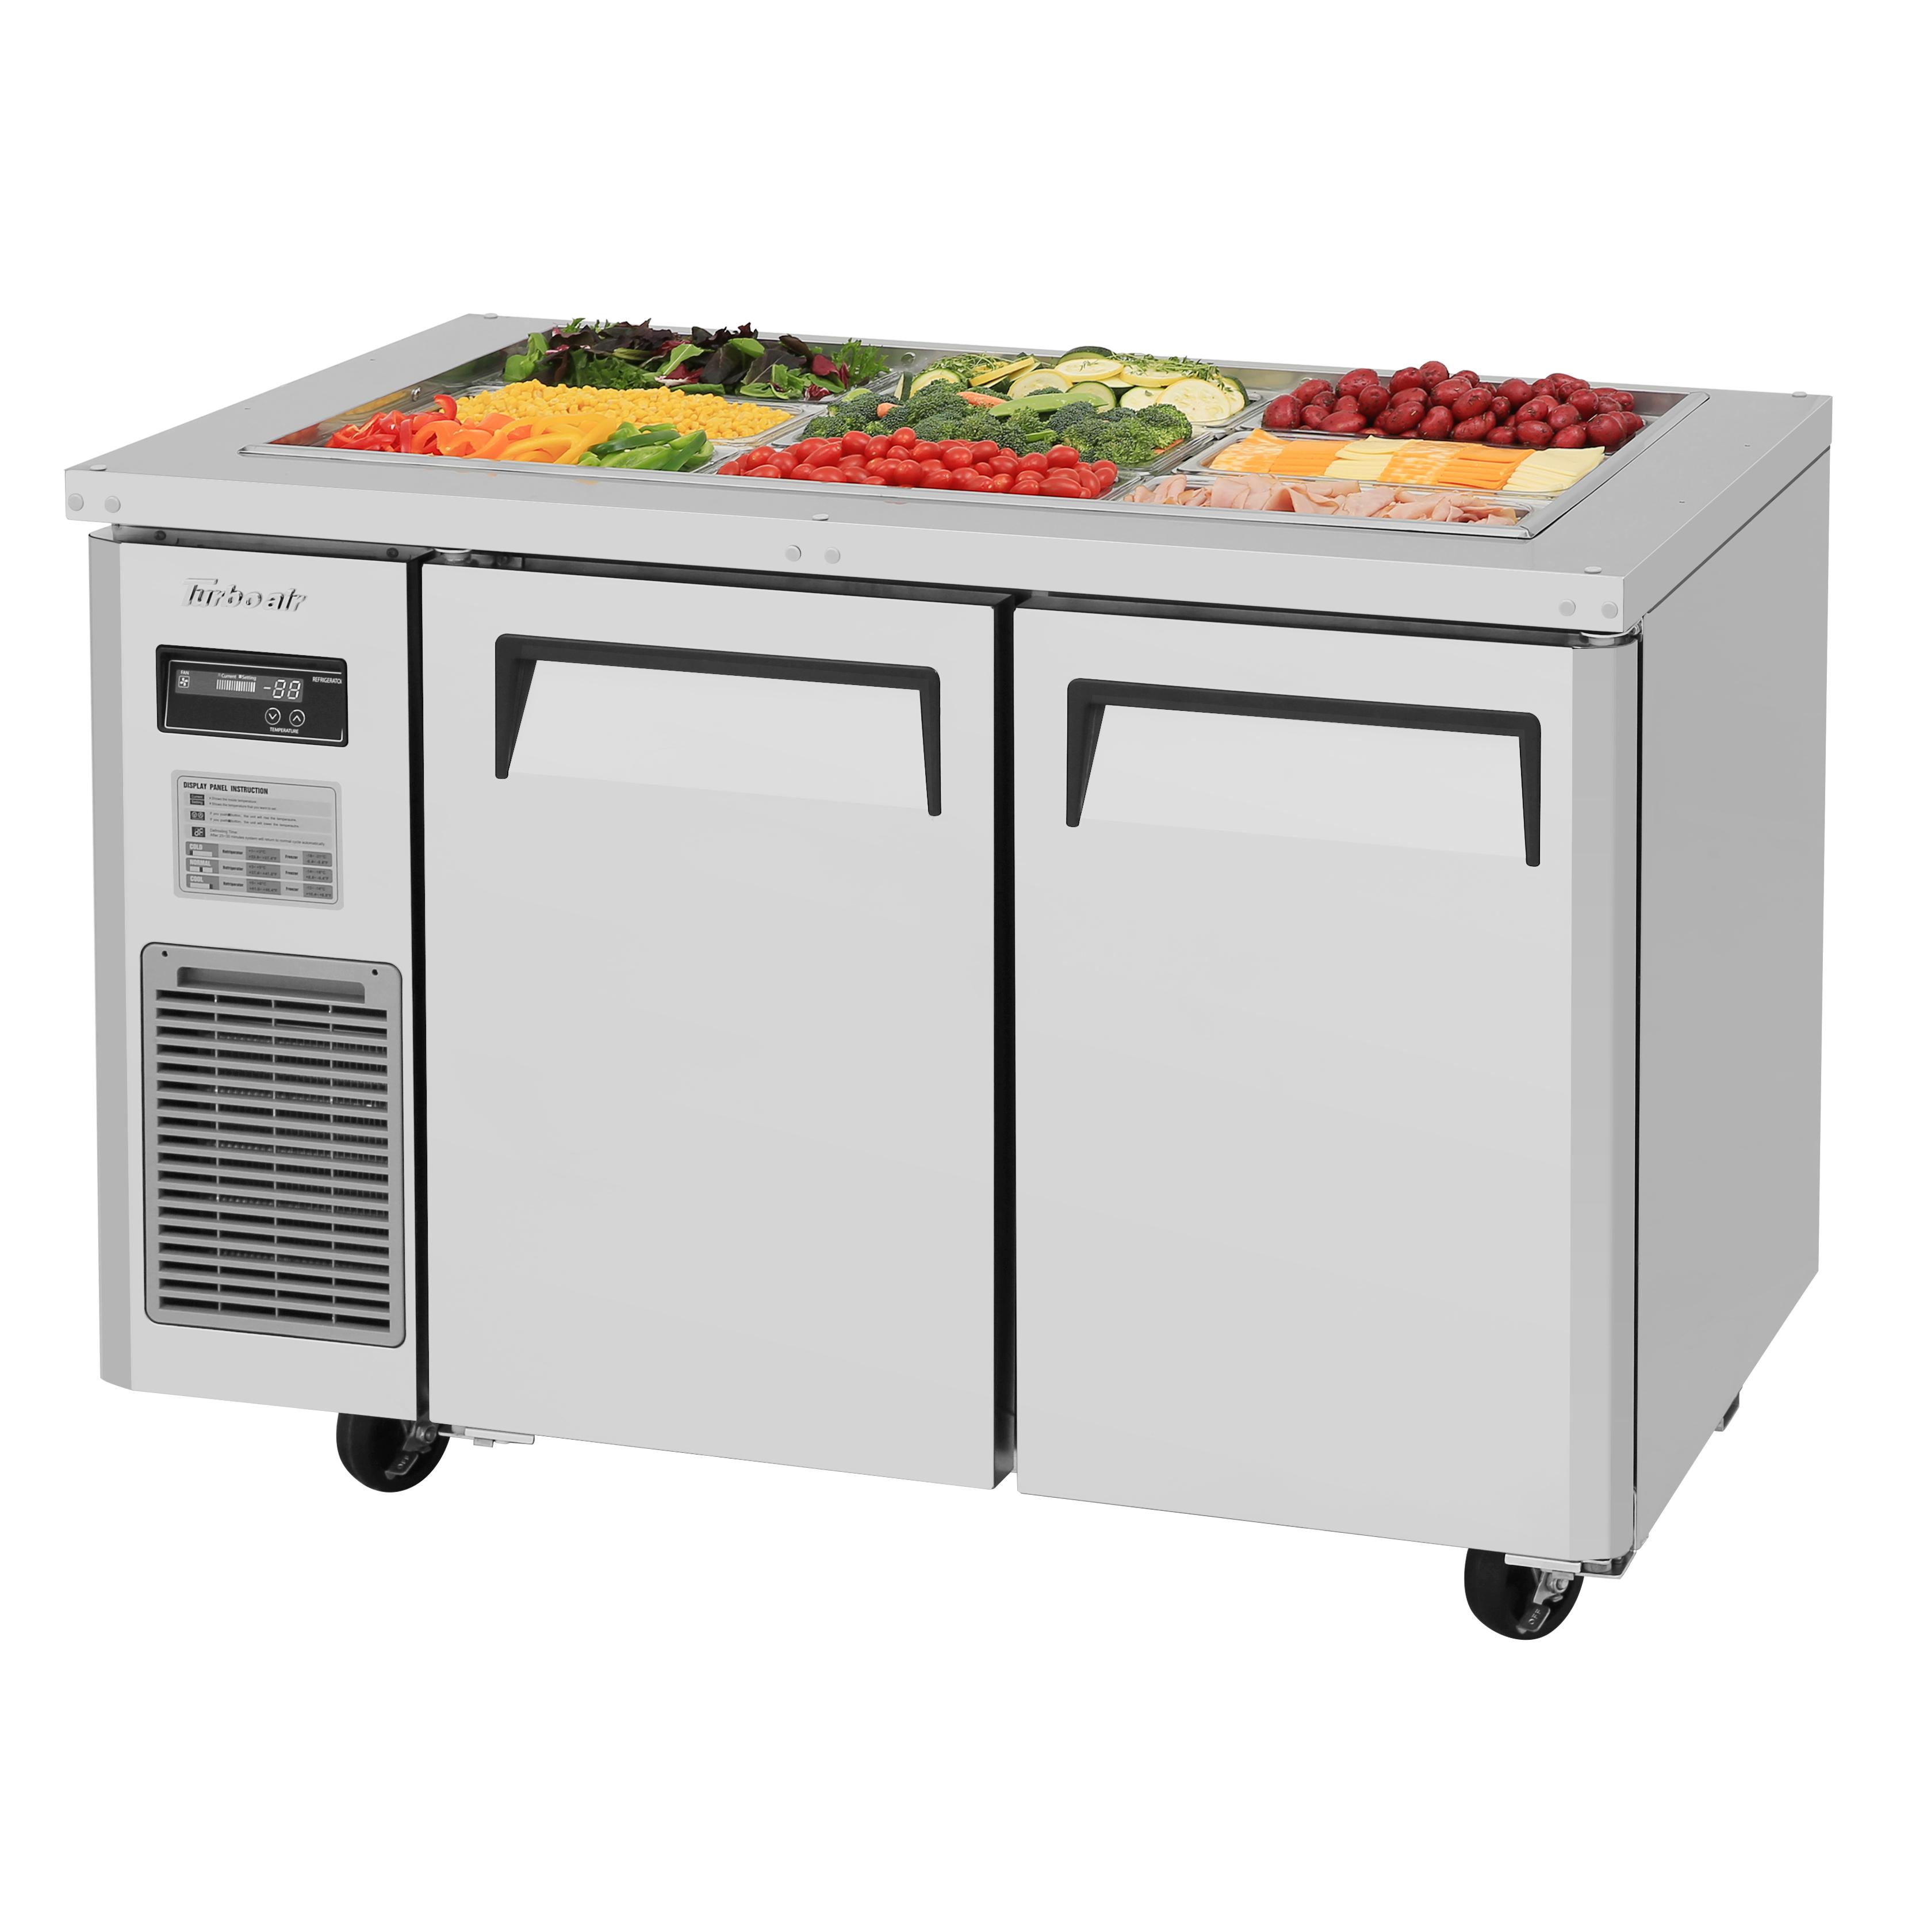 Turbo Air JBT-48-N refrigerated counter, sandwich / salad unit